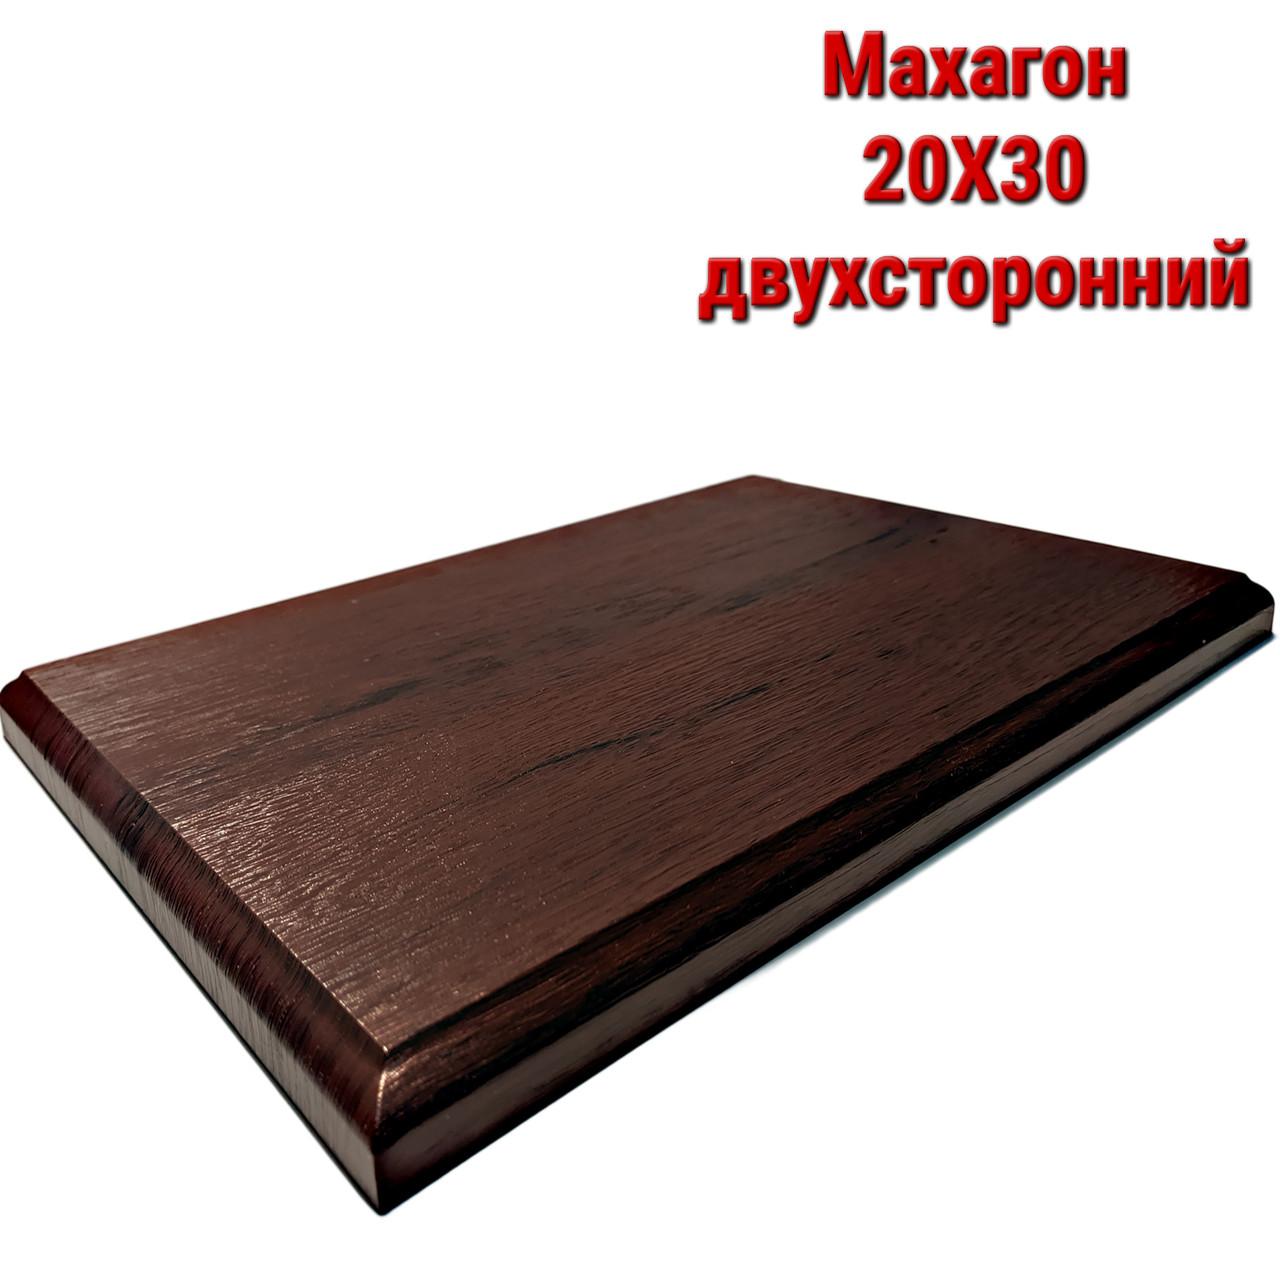 Плакетка (подложка для диплома) MDF 20x30 (махагон,двухсторонняя ламинация)